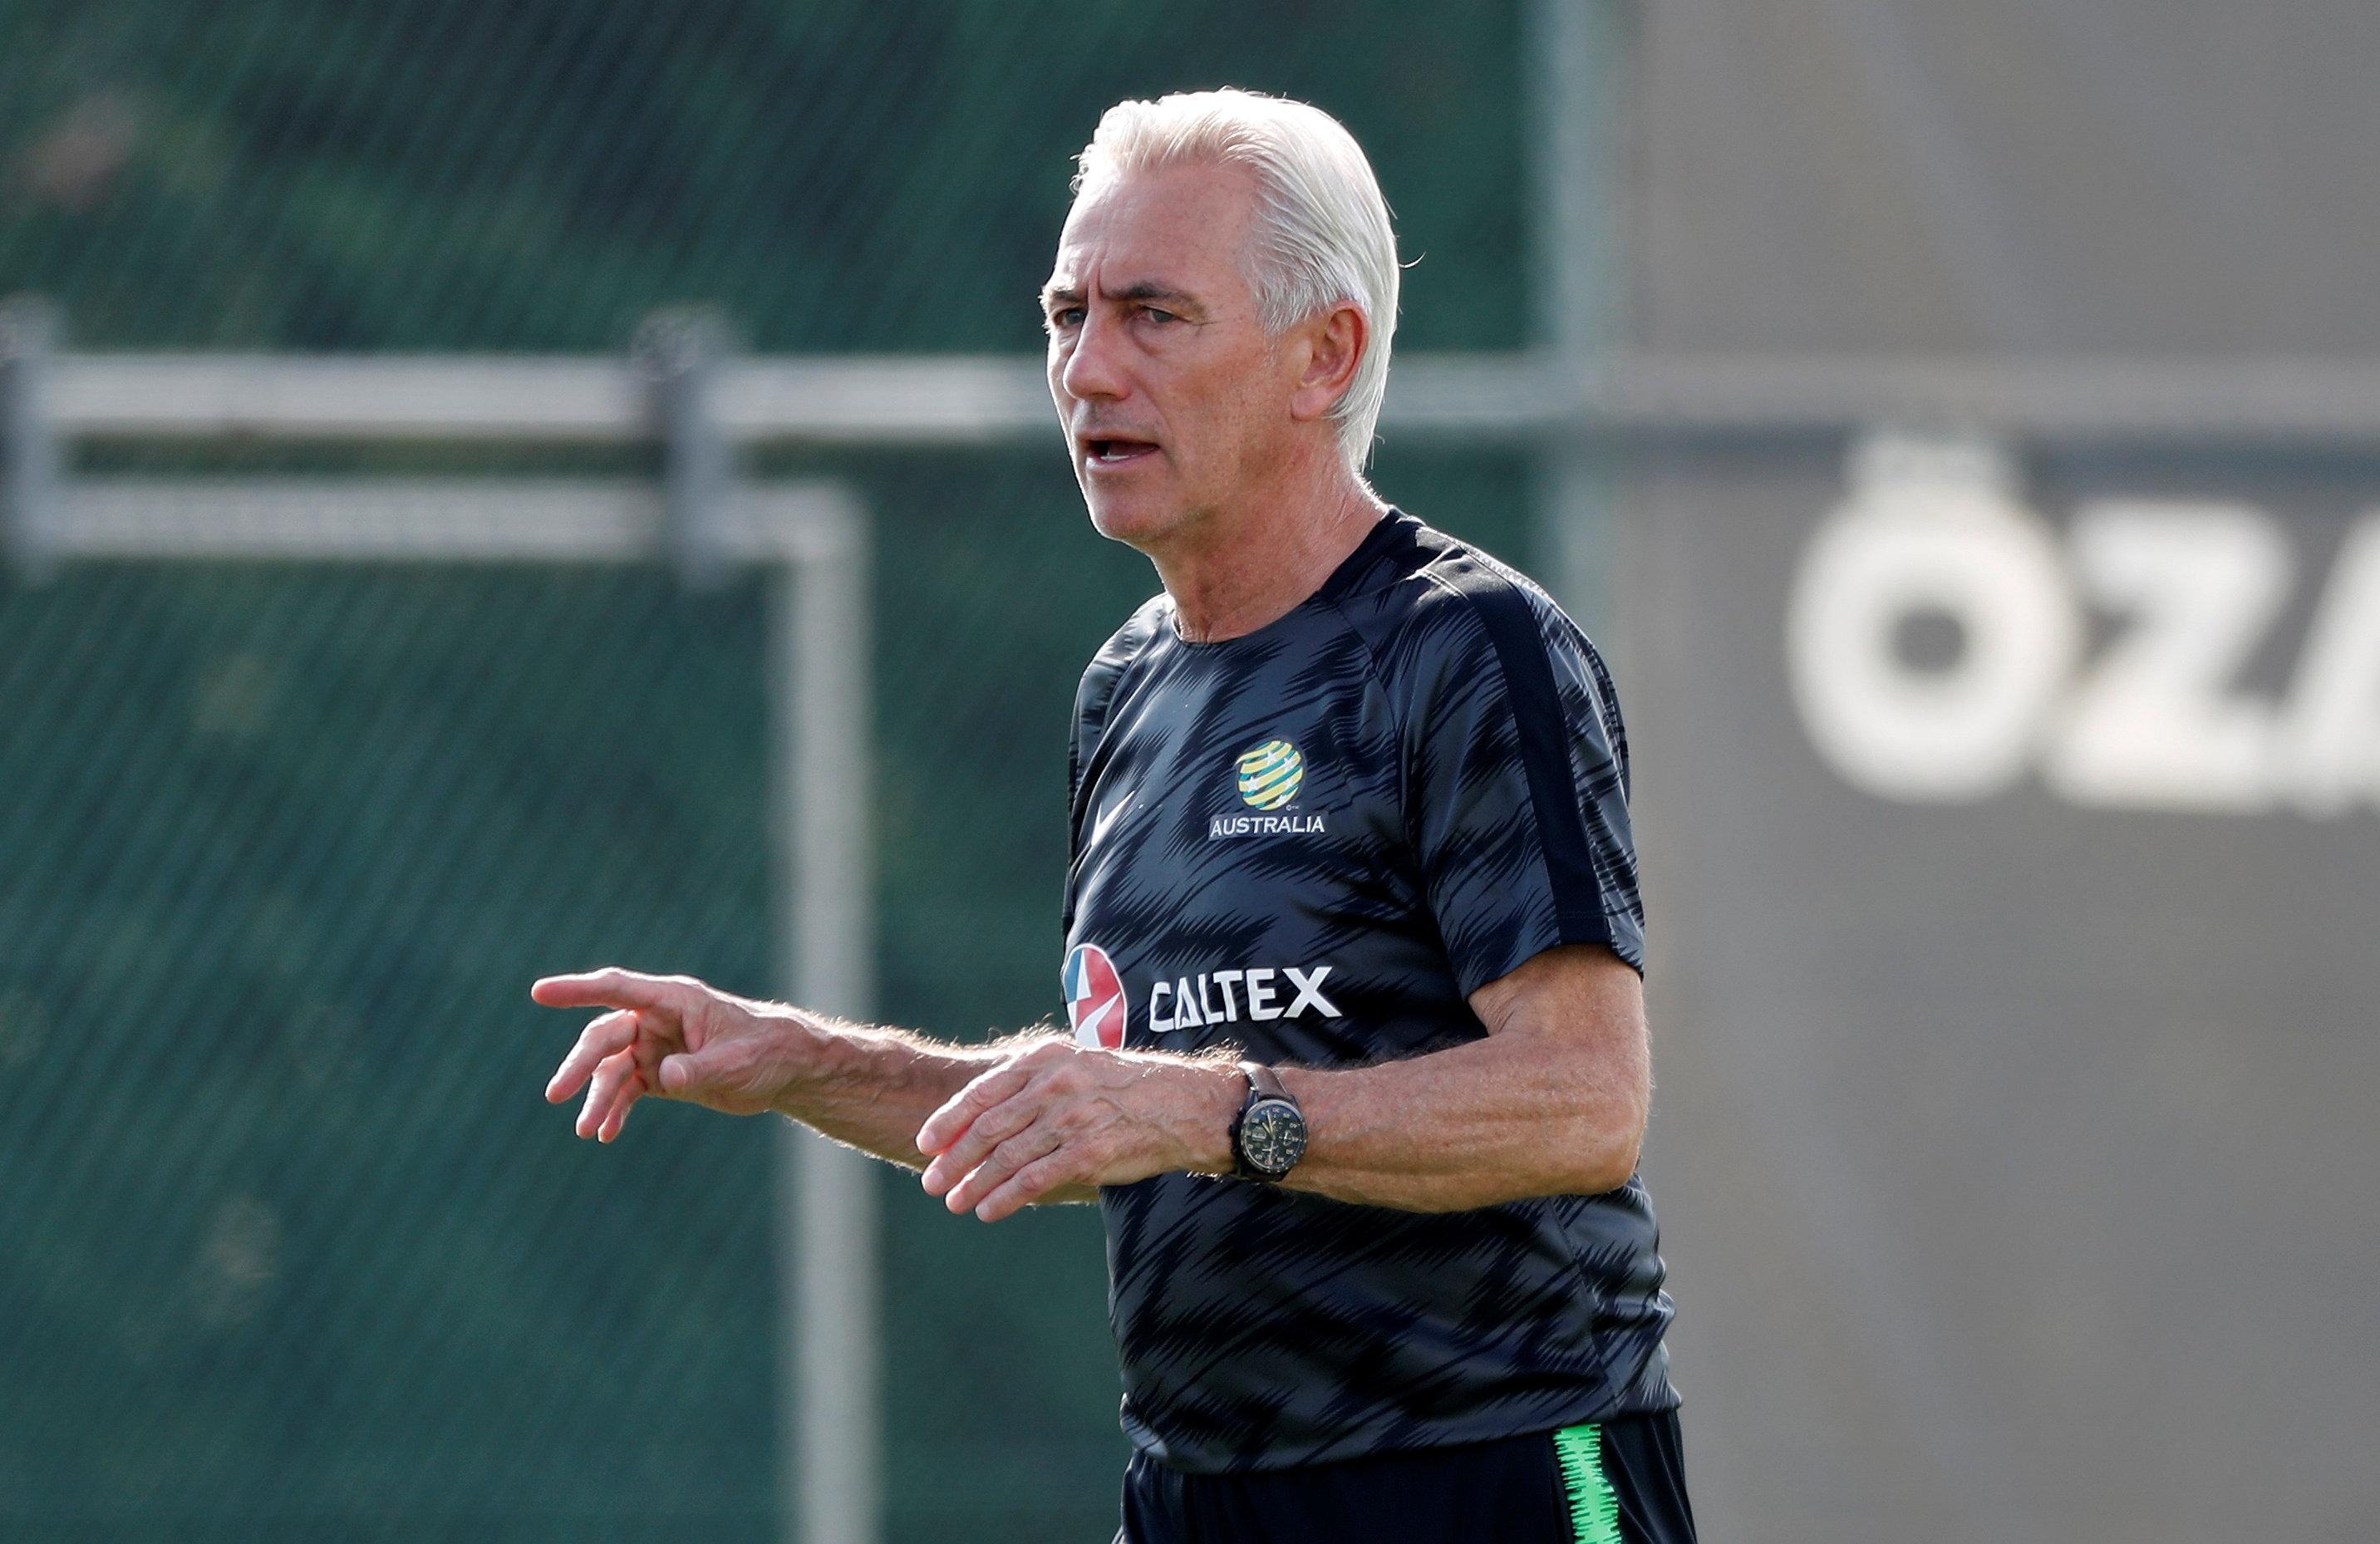 Australia coach Van Marwijk tasked with Russia rush job